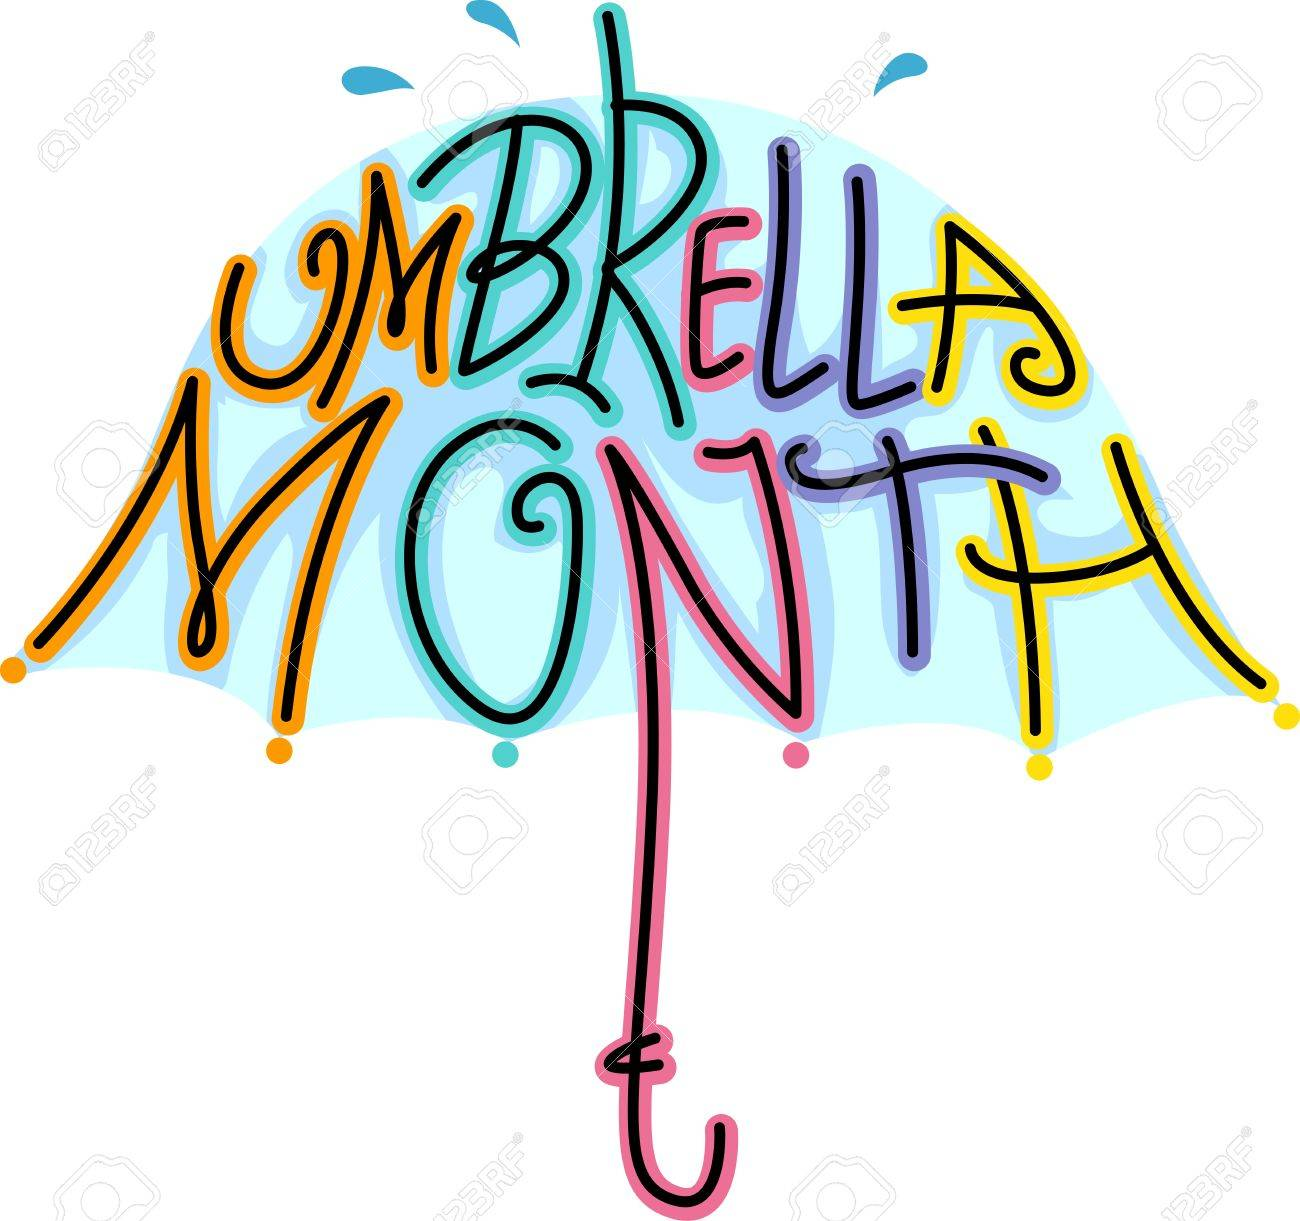 Text Illustration Celebrating Umbrella Month Stock Illustration - 12325663